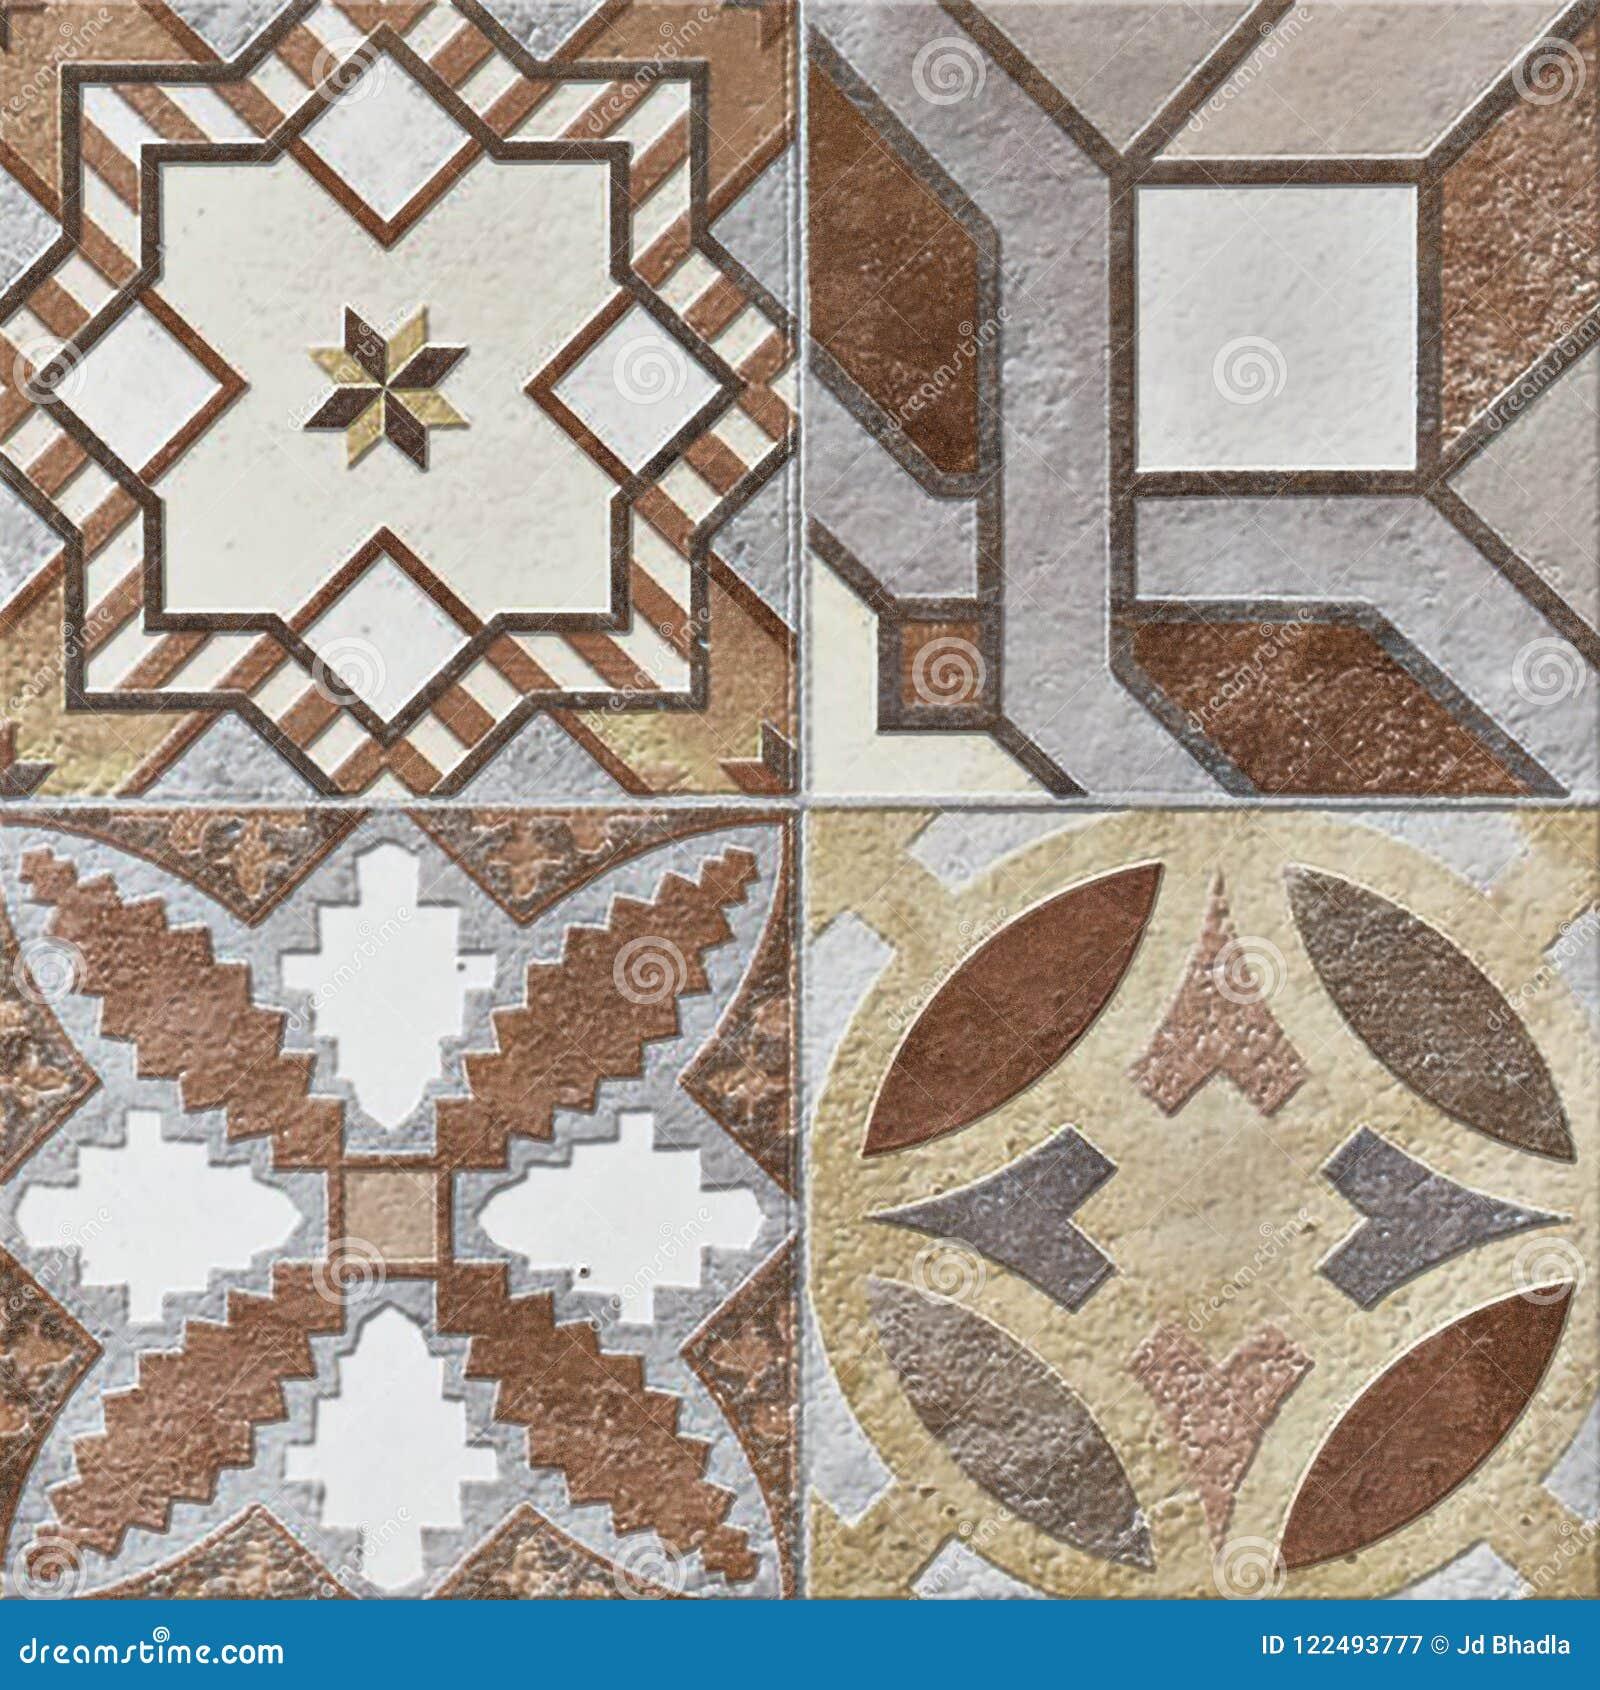 Rustic Beige Wall Mosaic Design Beautiful Mosaic Decor Tiles High